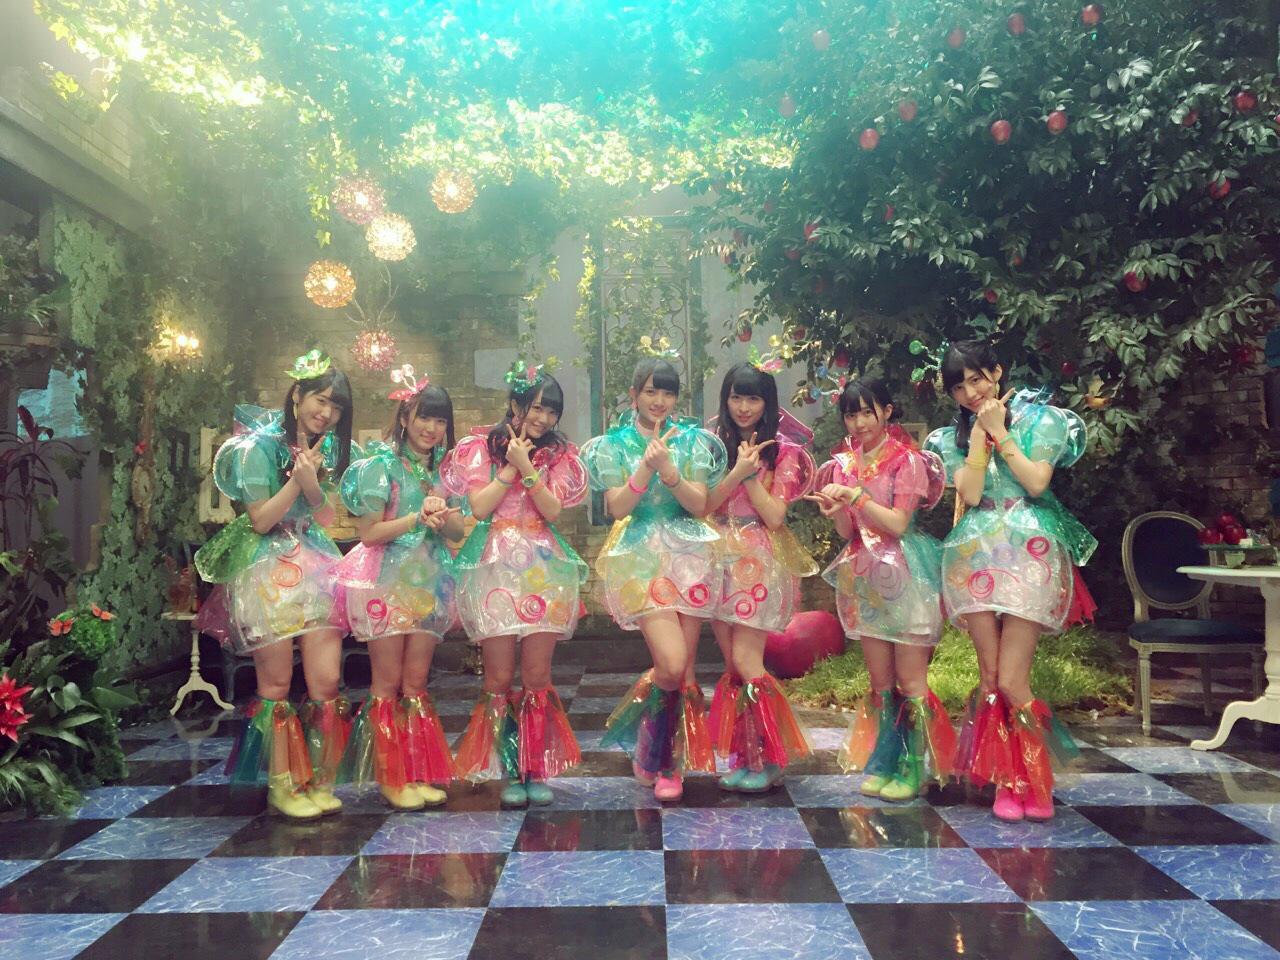 【AKB48】大和田南那応援スレ☆27【なーにゃ】 YouTube動画>15本 ->画像>723枚